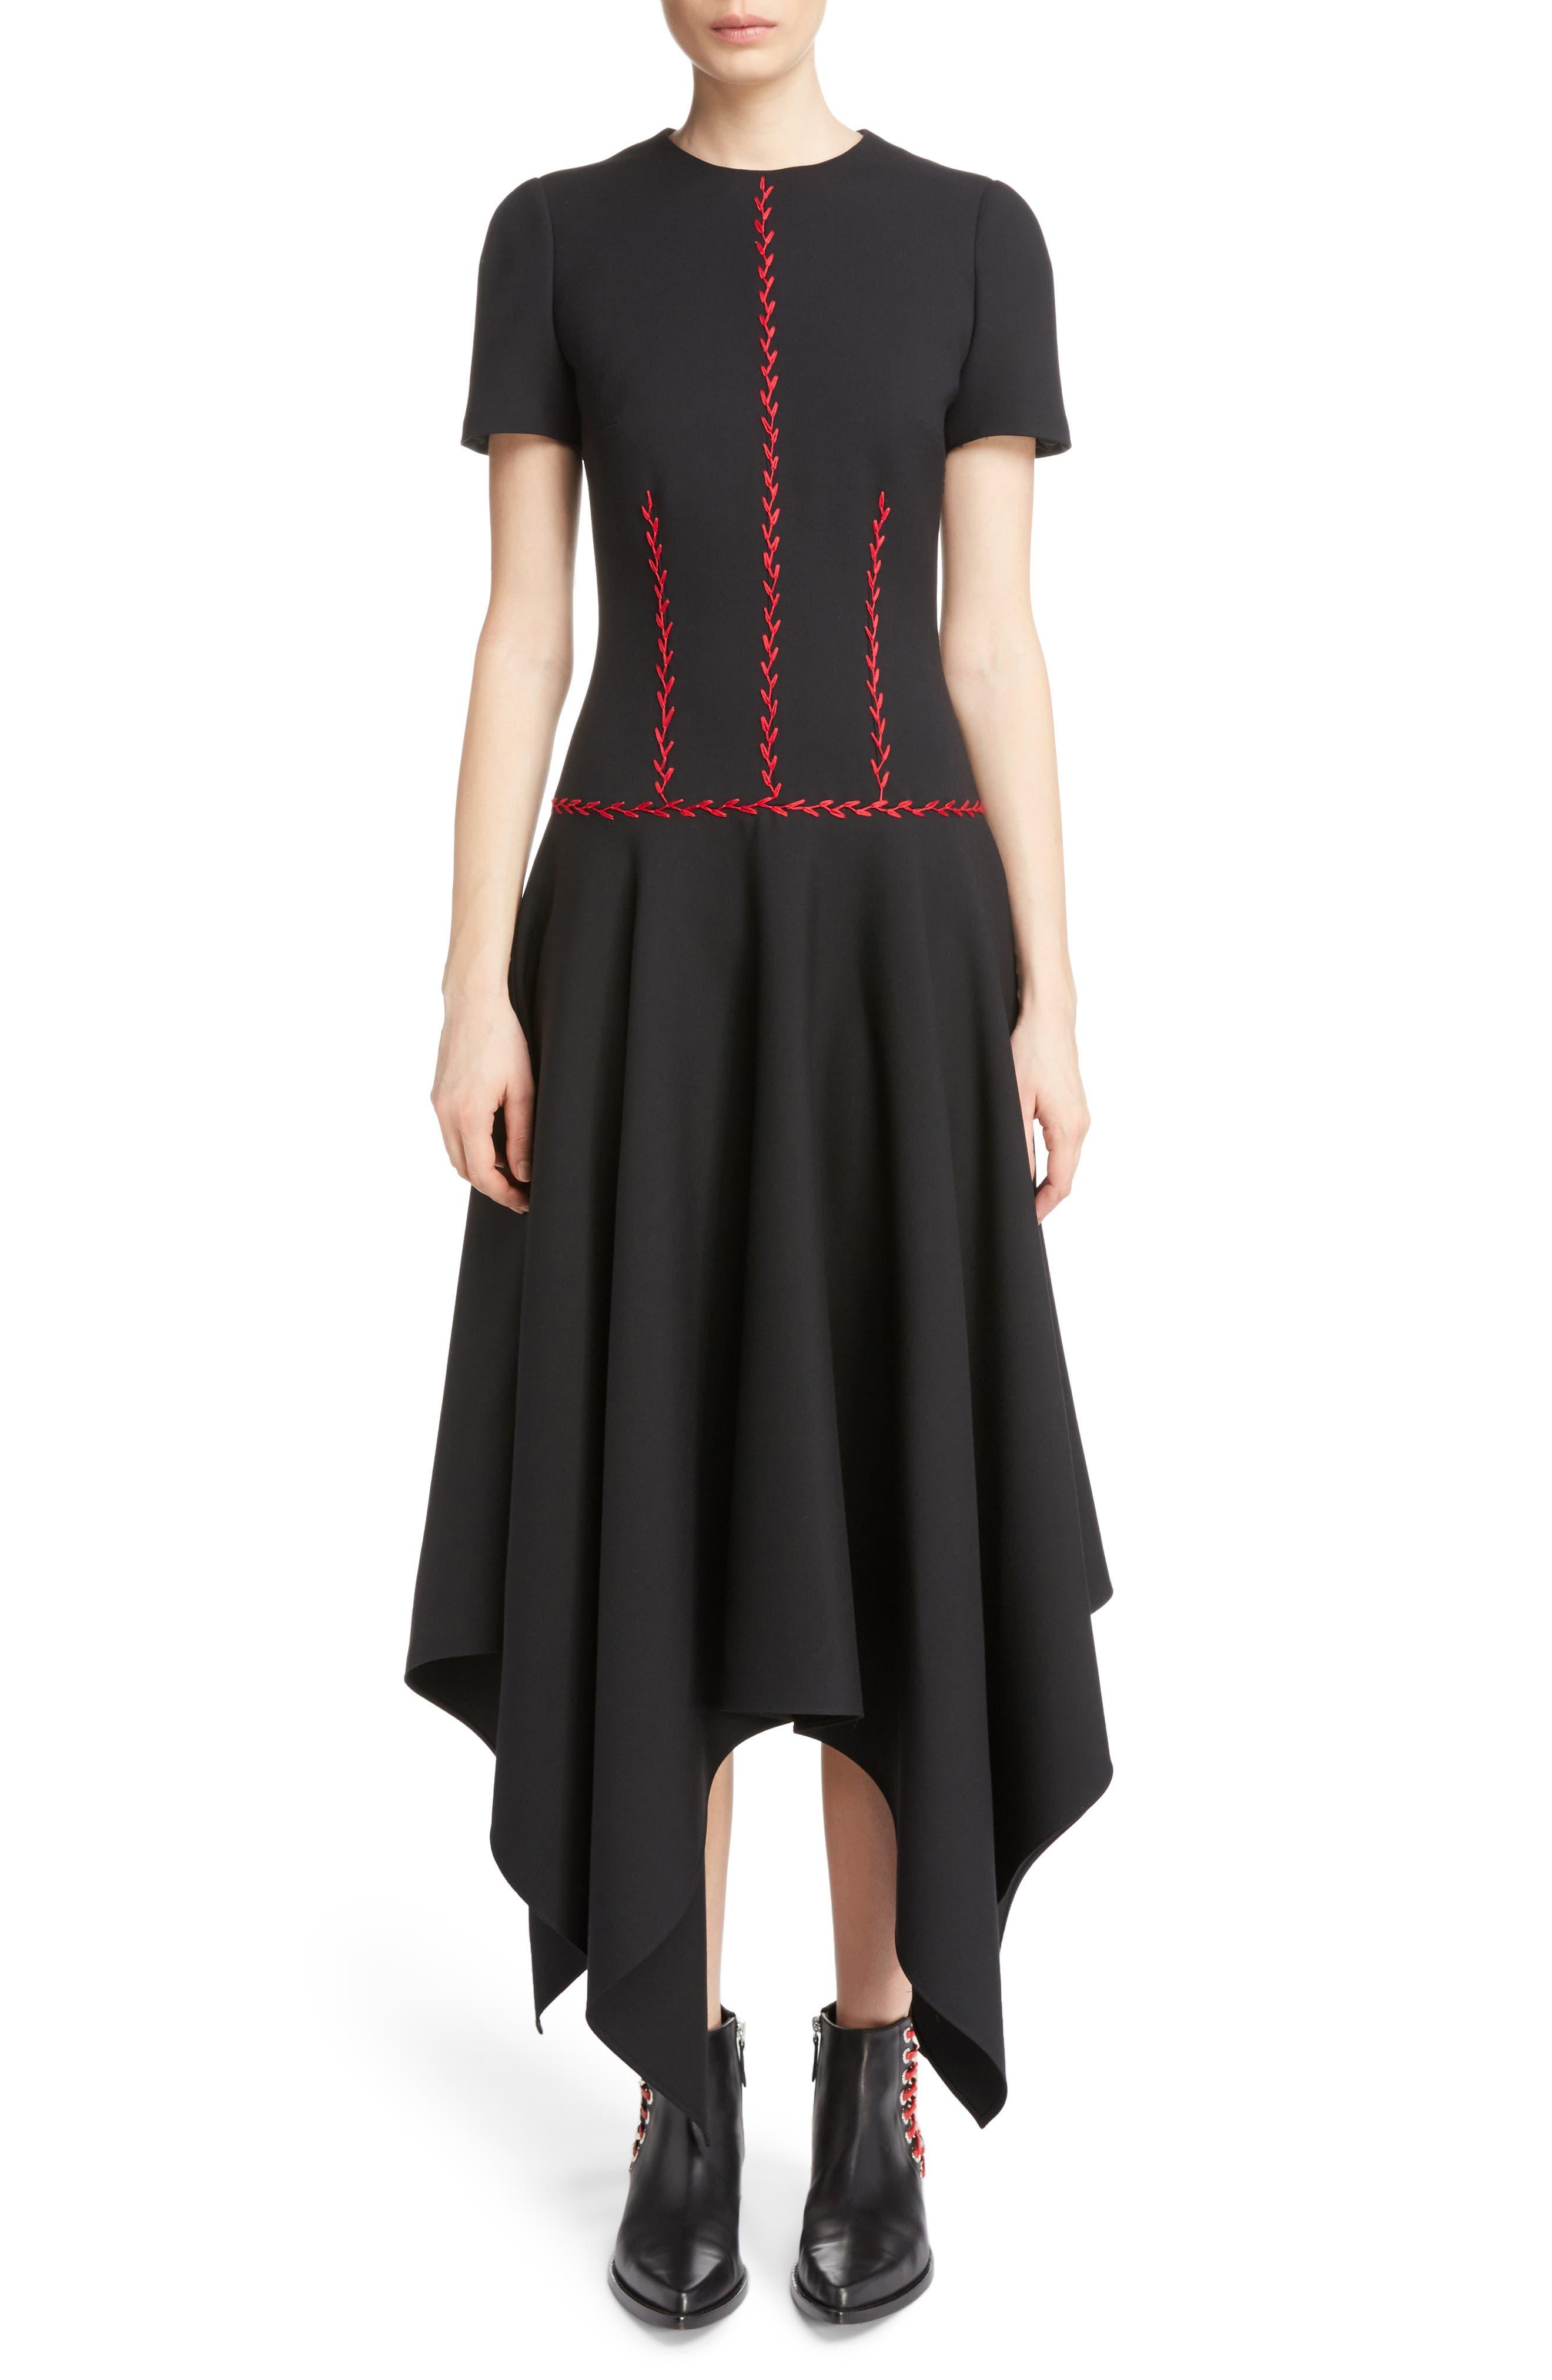 Alexander McQueen Stitched Handkerchief Hem Dress